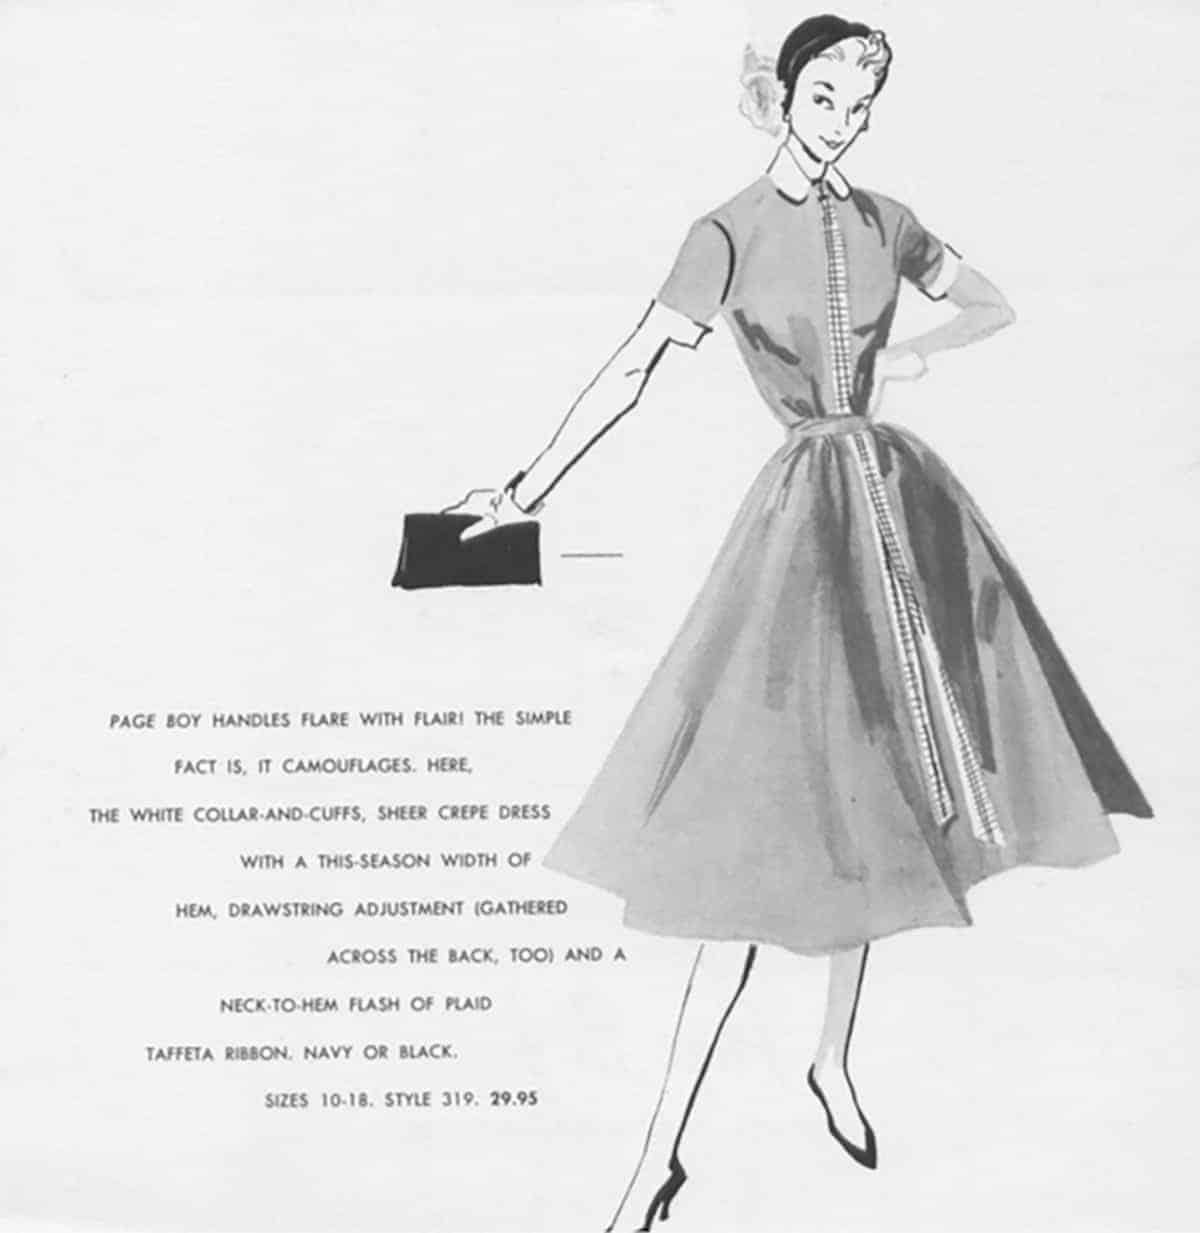 Page Boy ad, 1950s